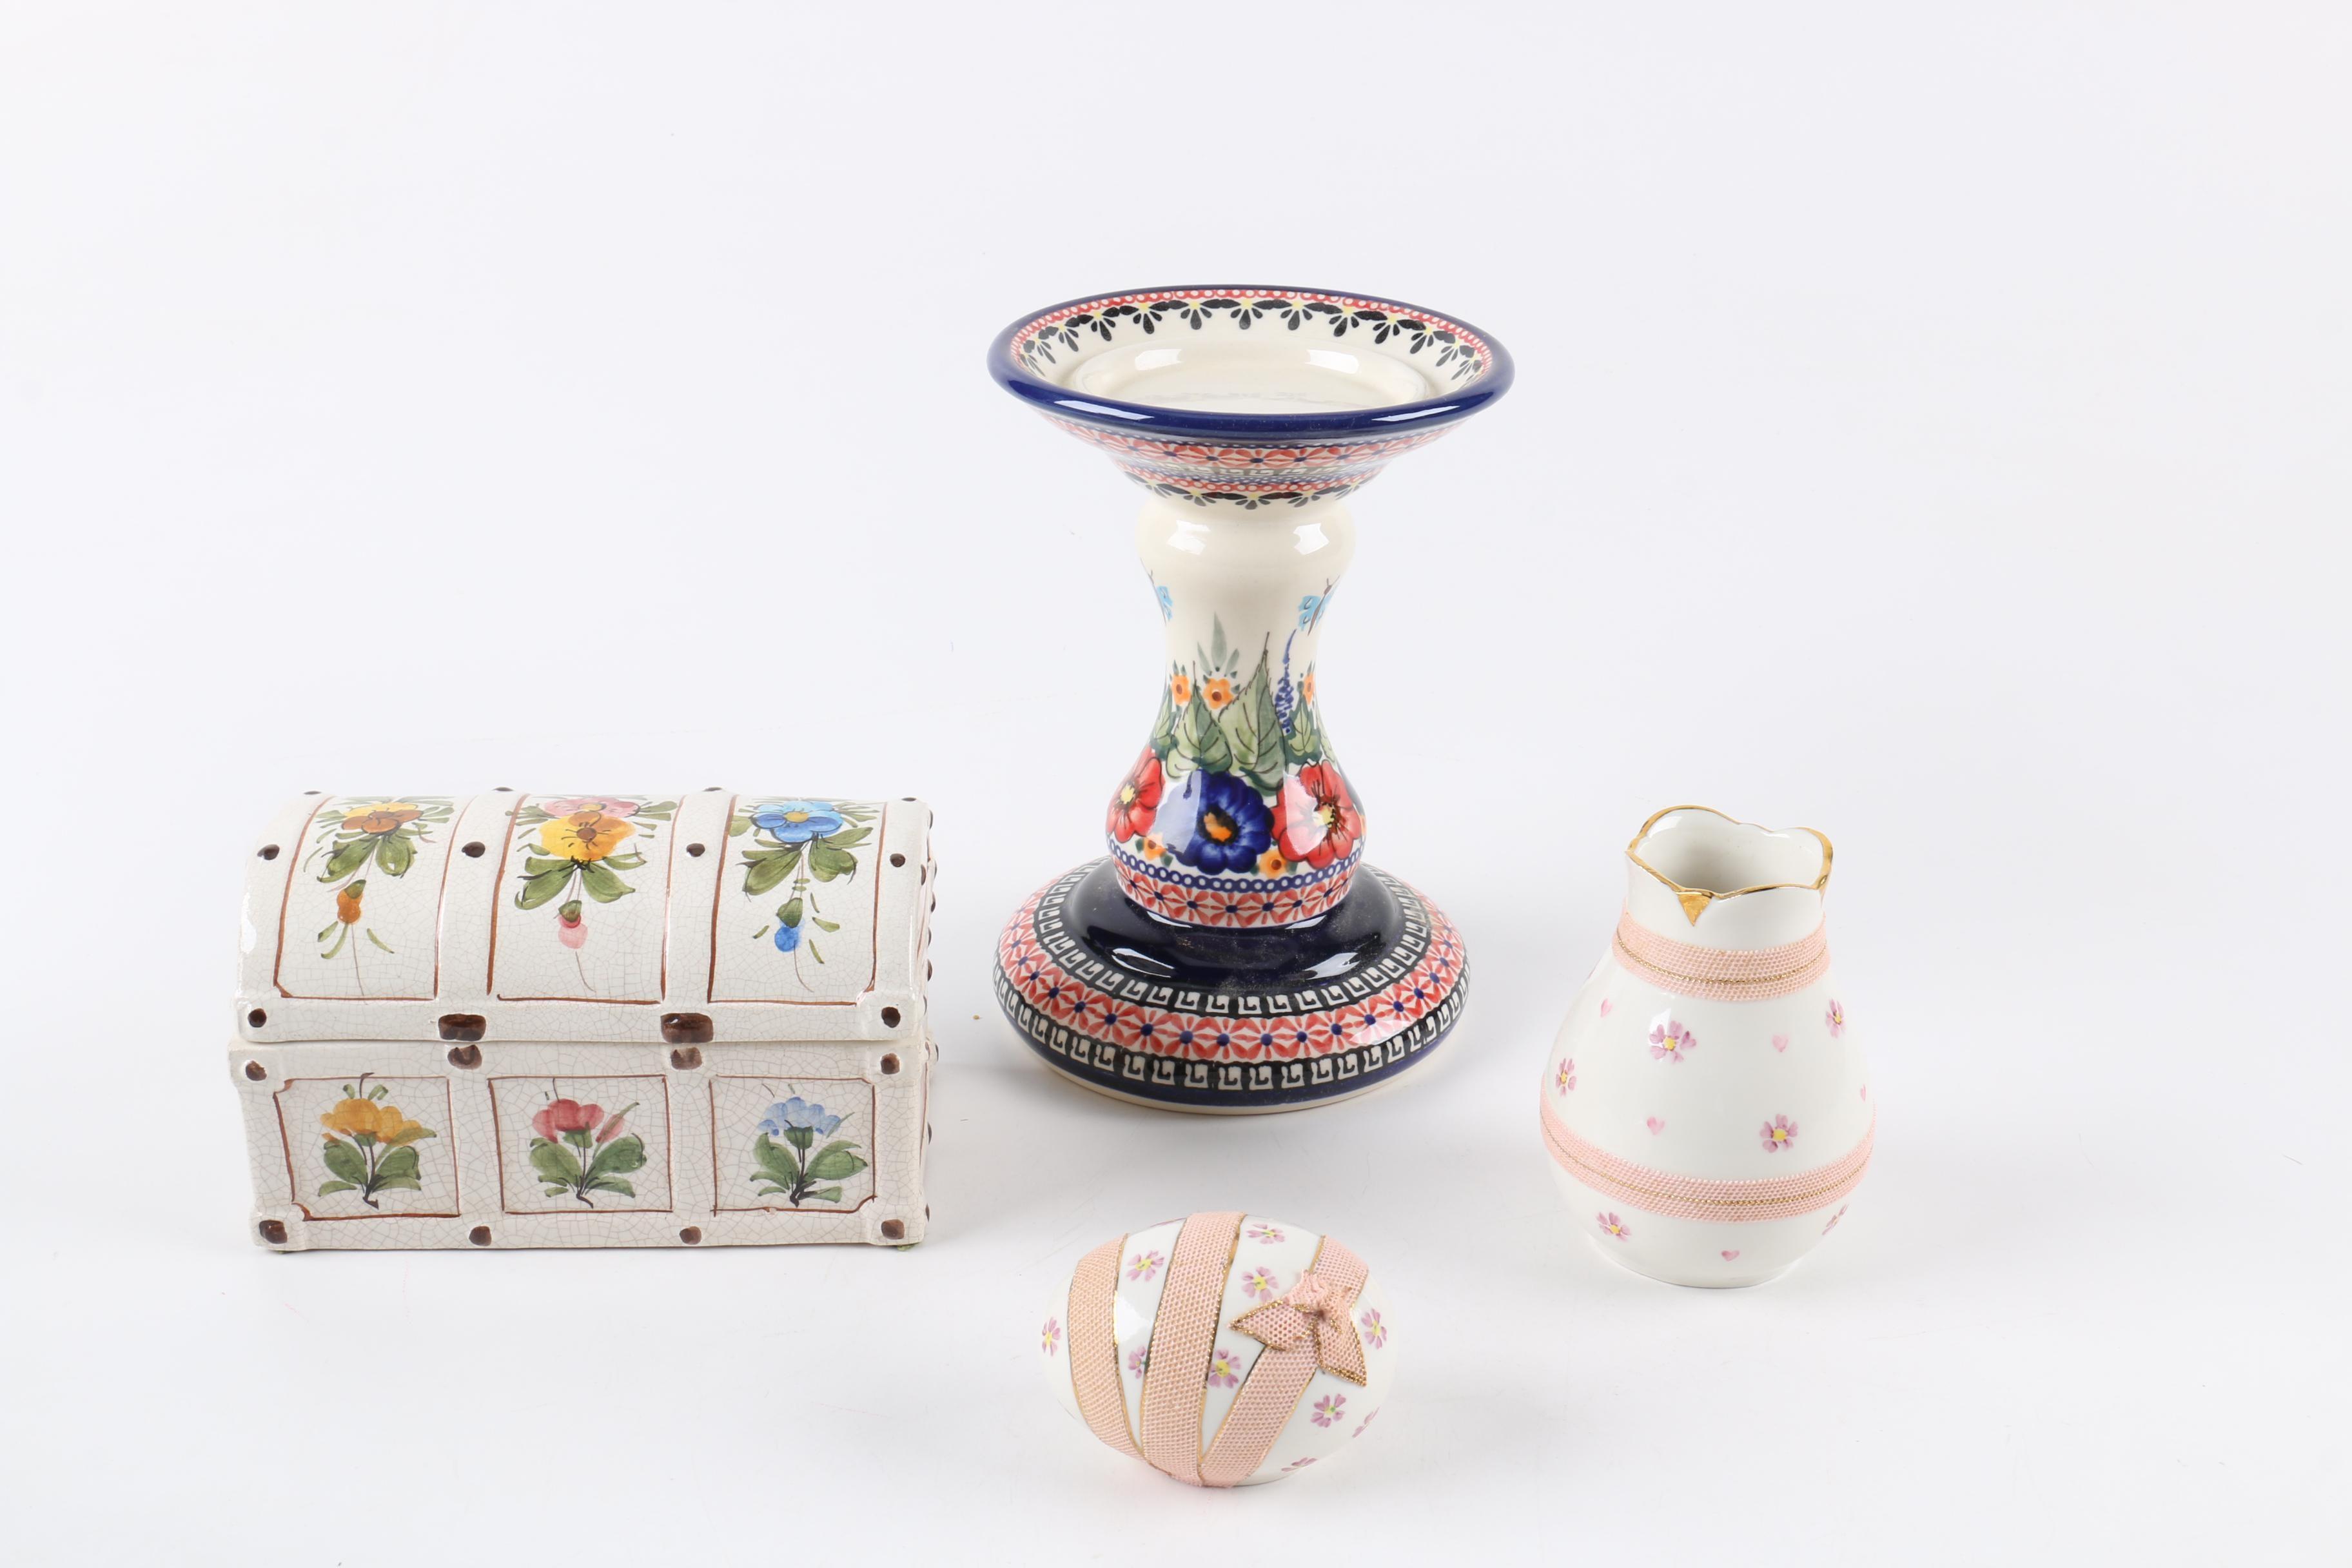 Porcelain and Ceramic Decorative Accessories